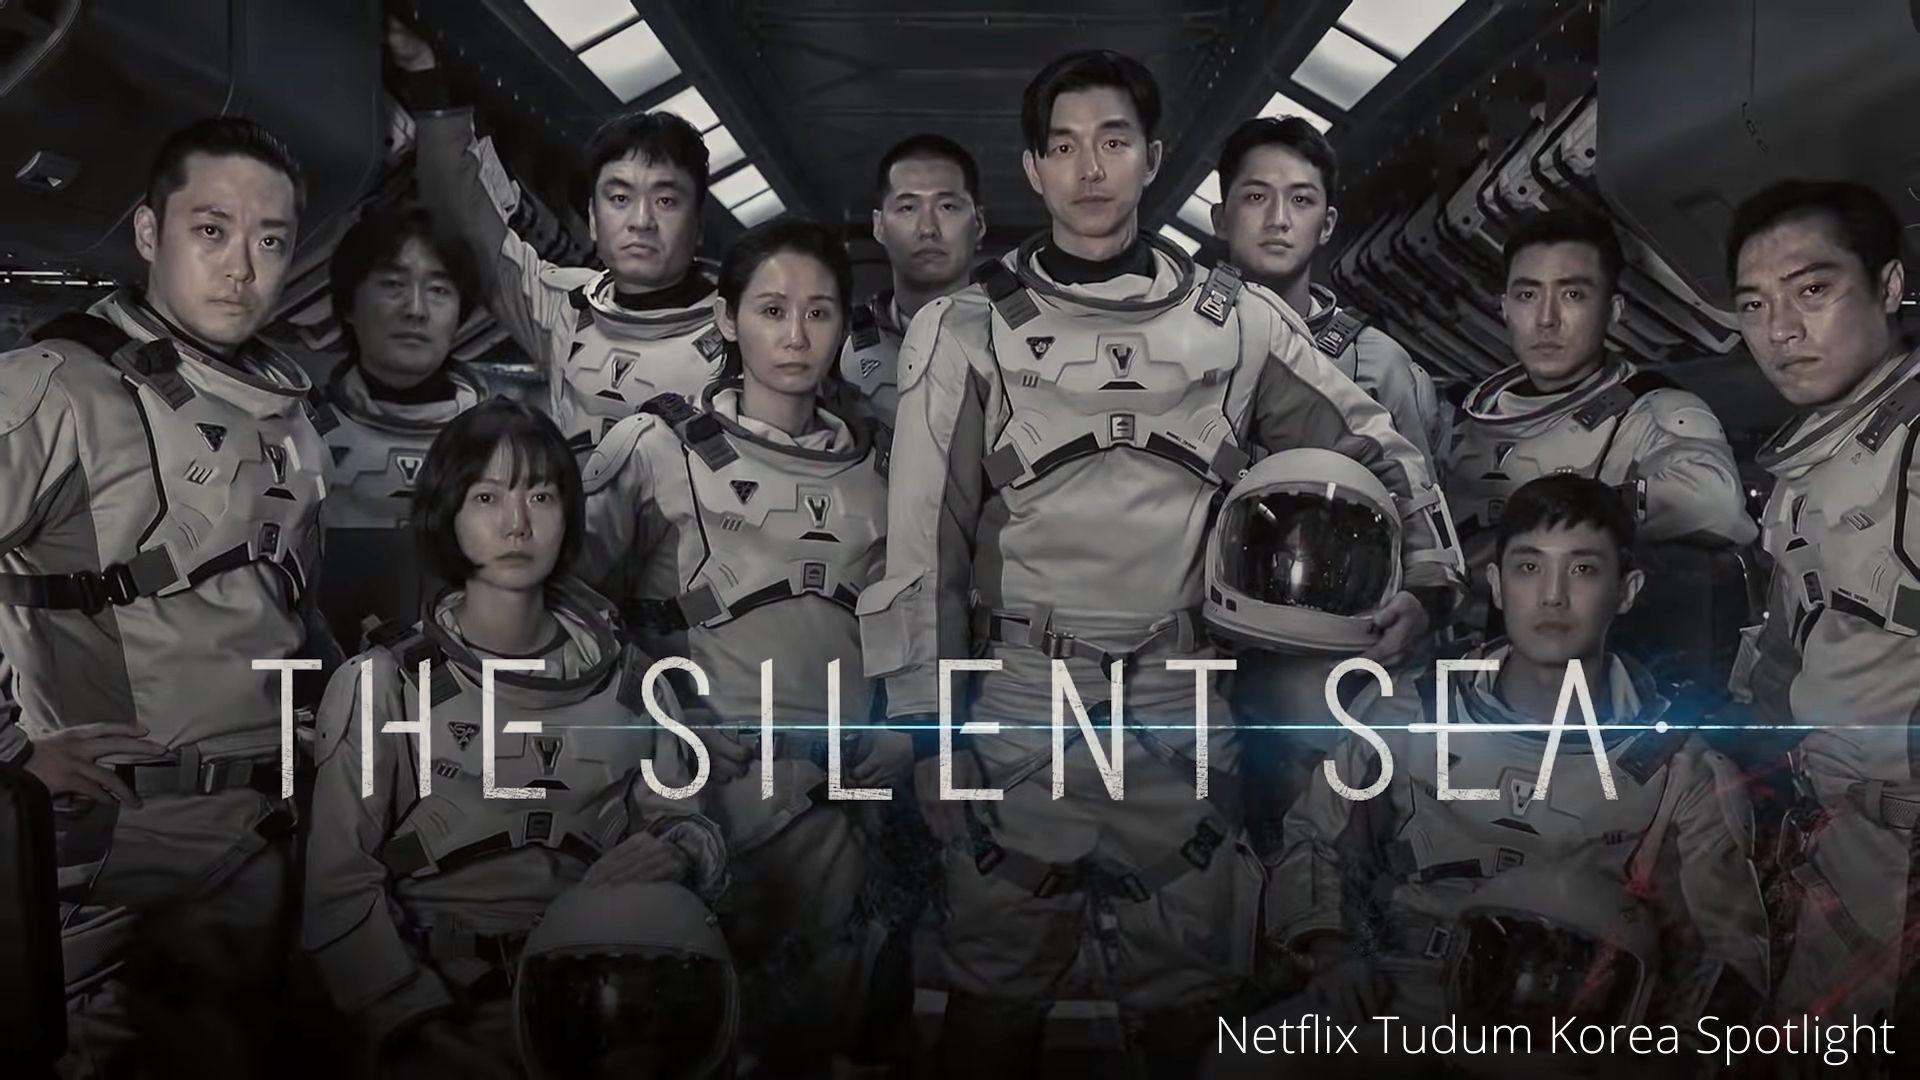 Netflix TUDUM Korea Spotlight 2021